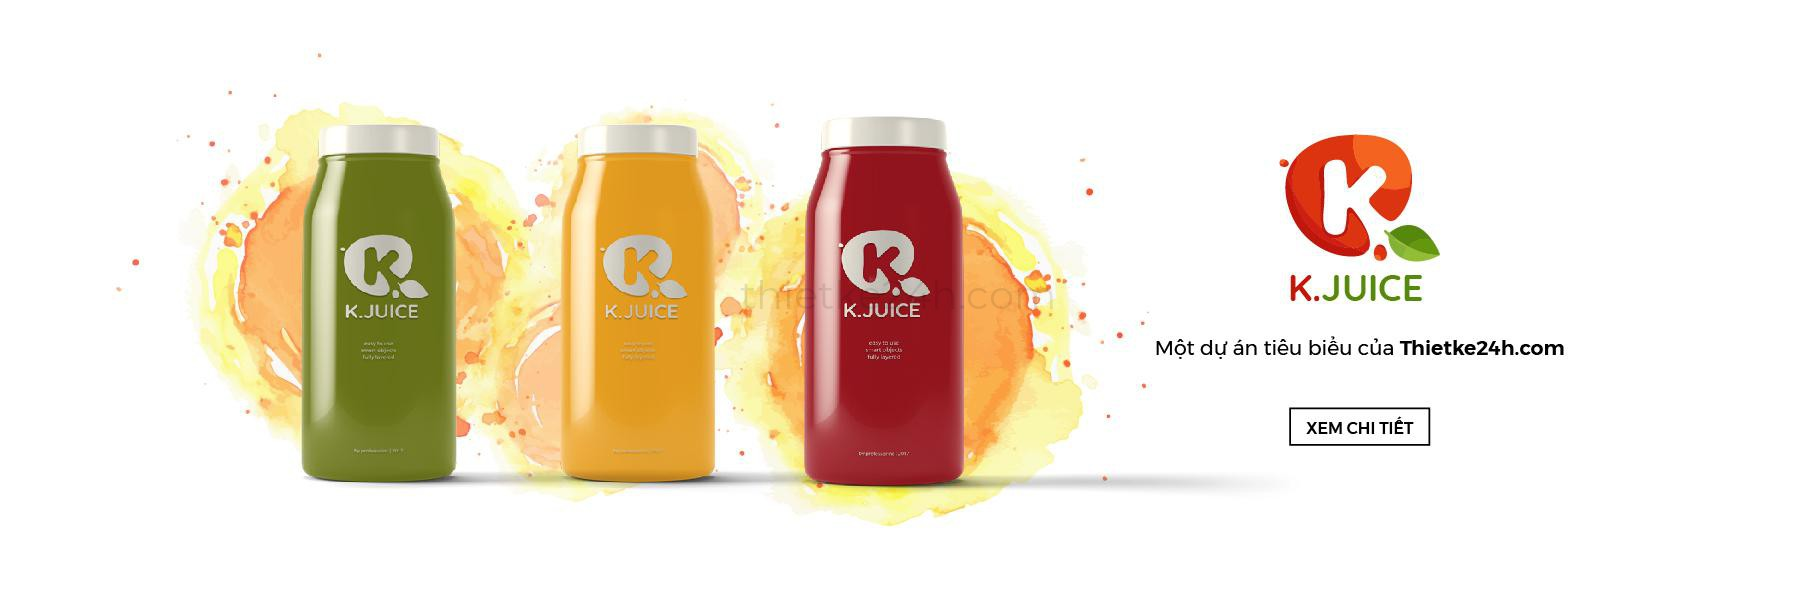 K.Juice-logo